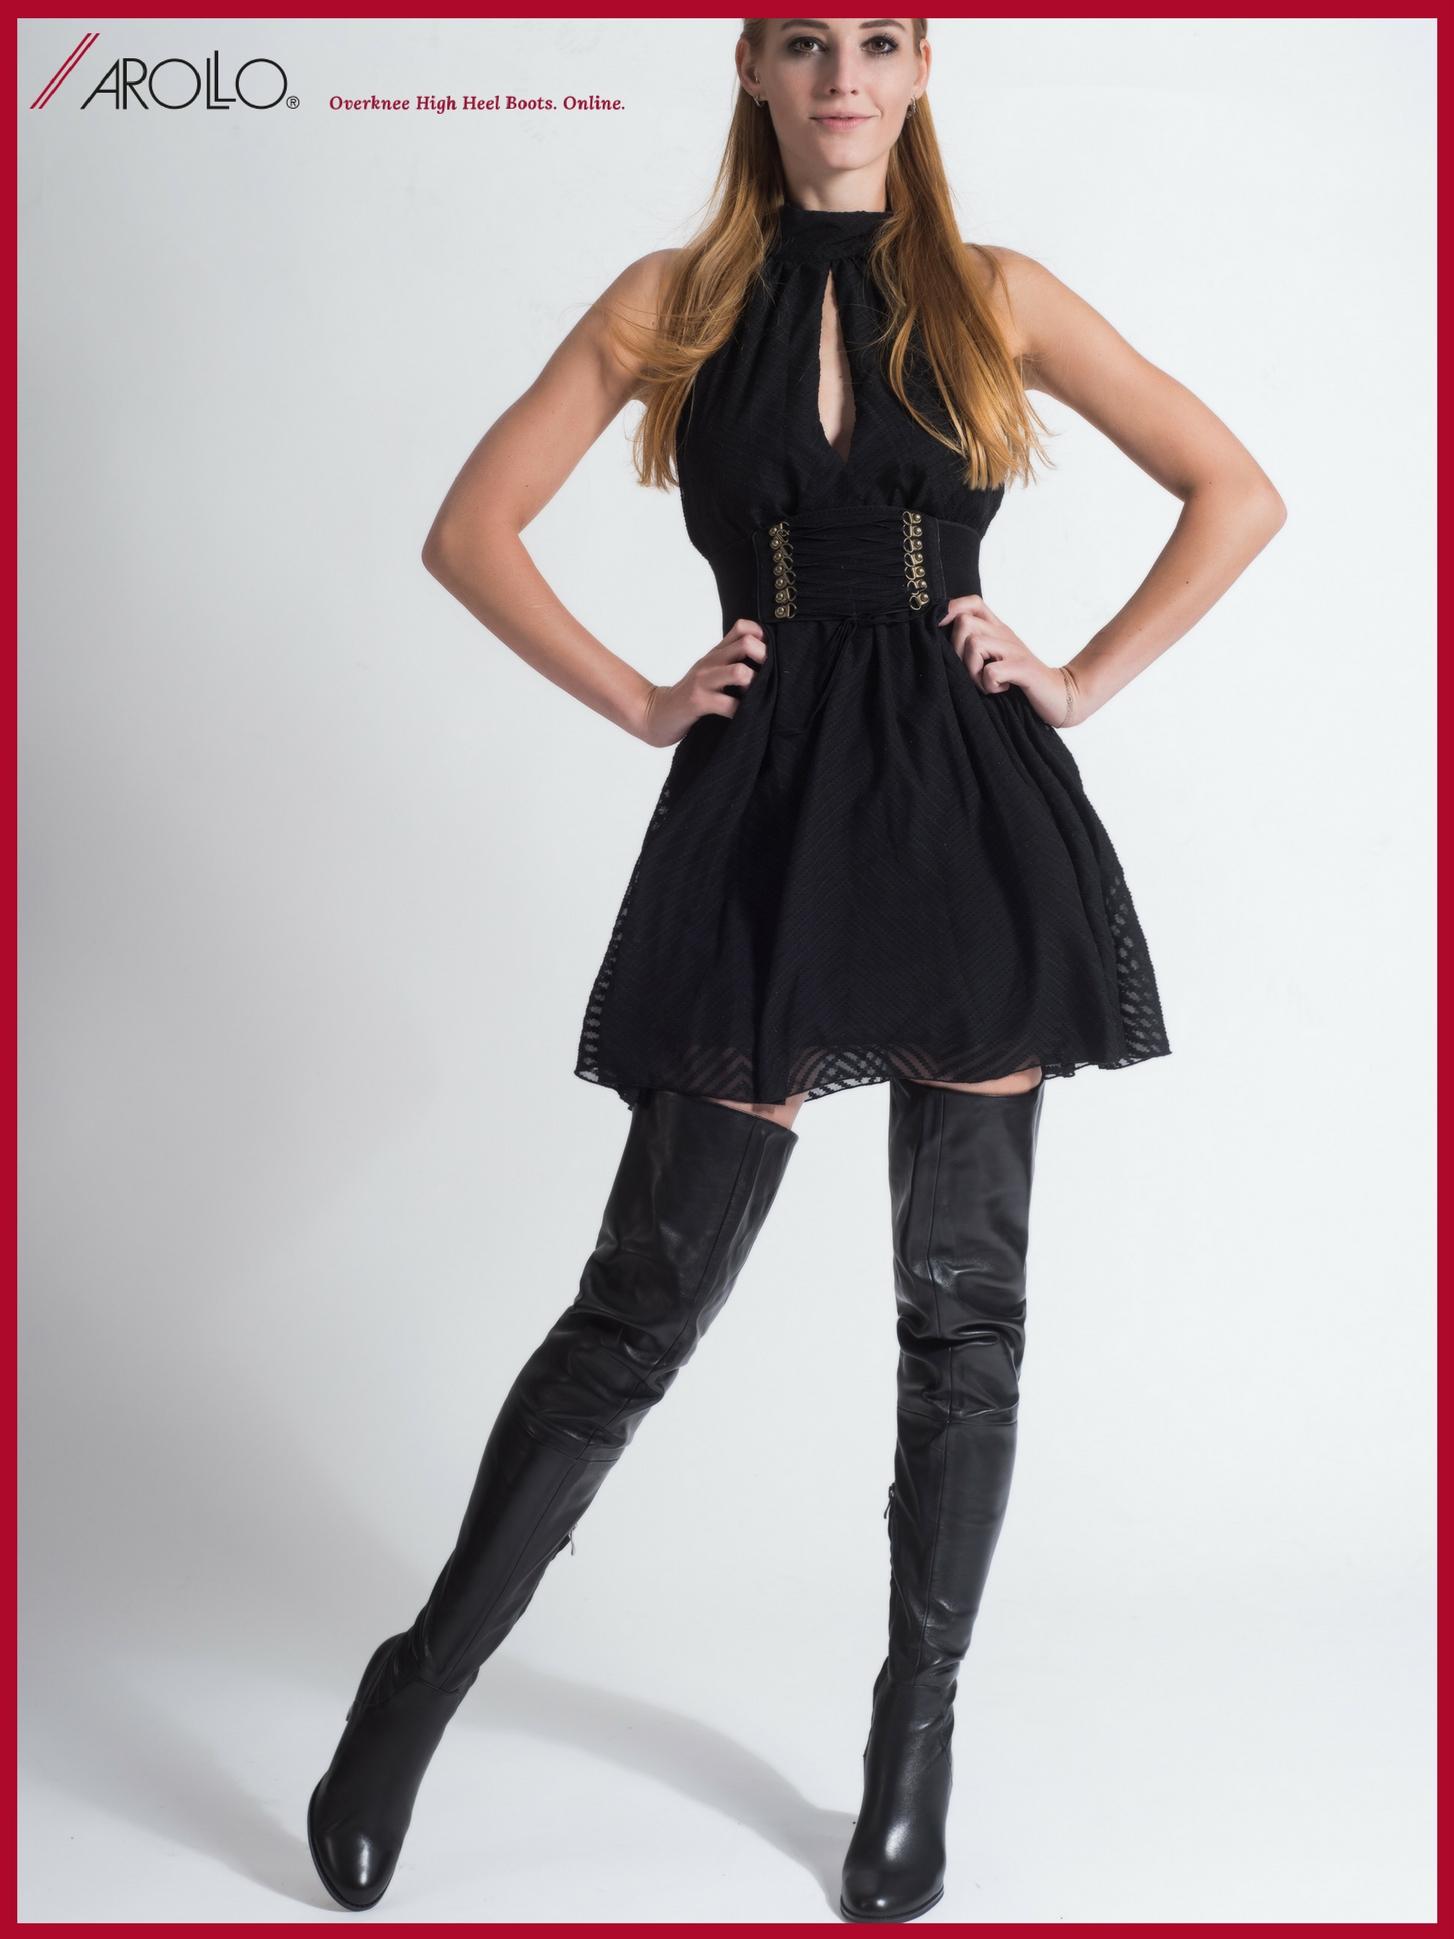 Arollo Leather Heeled Boots AROLLO-Thigh-High-Crotch-Boots-Victoria-II